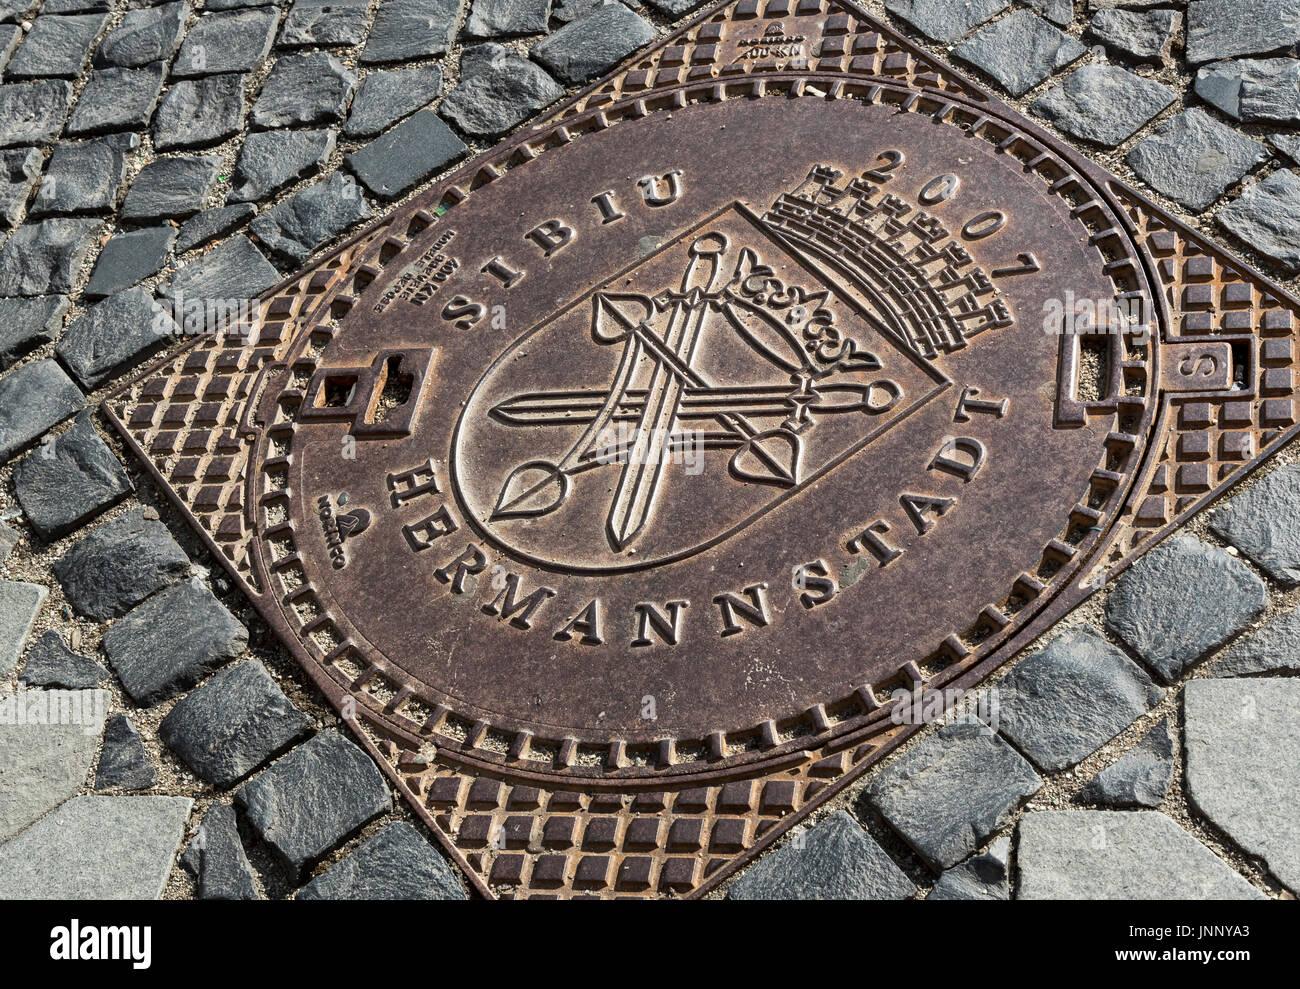 Manhole cover, Sibiu - Hermannstadt, Romania - Stock Image